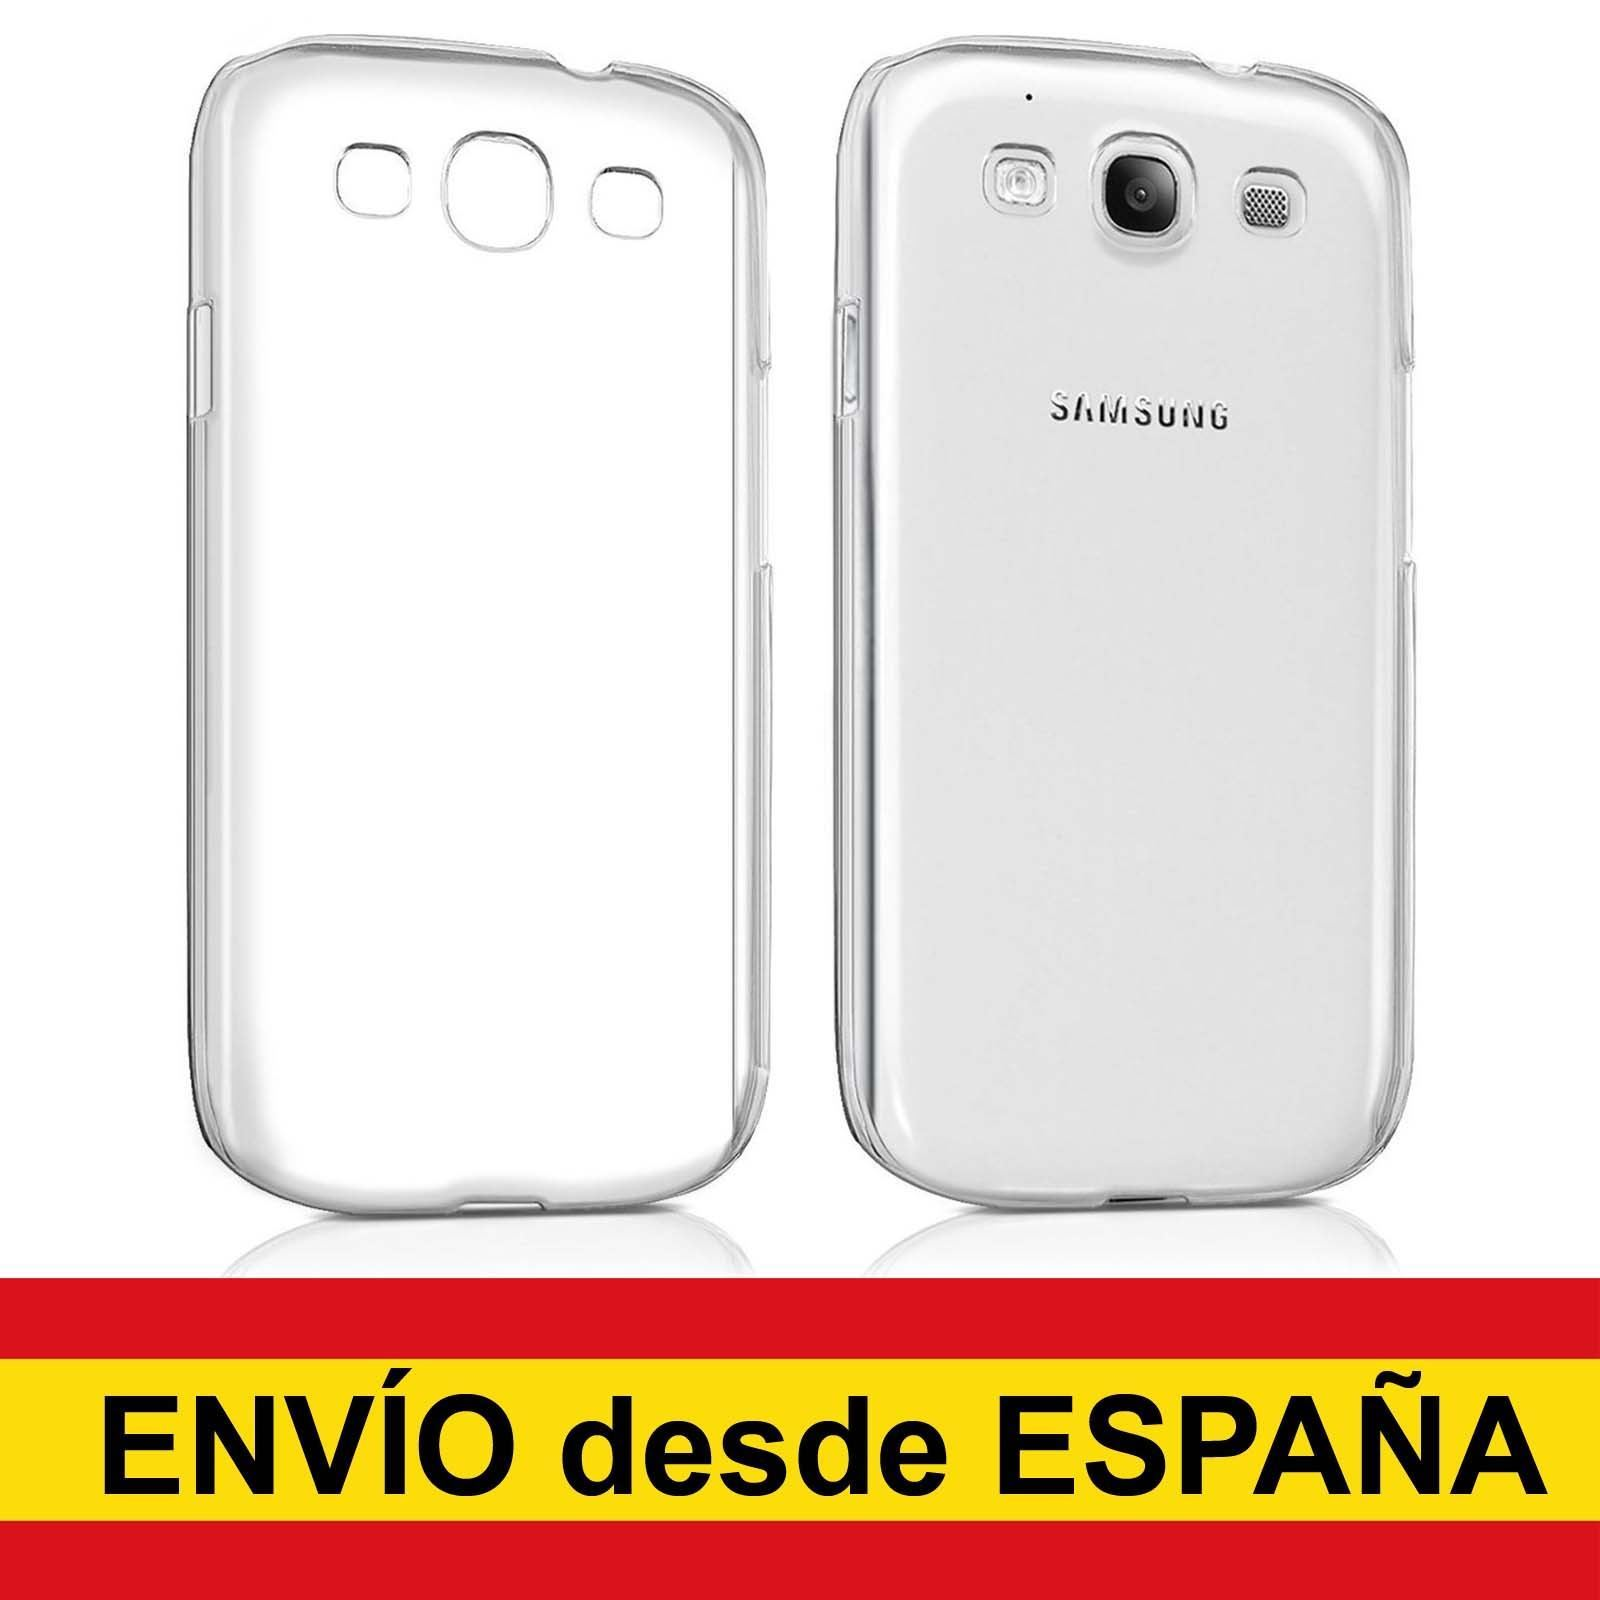 9924378d648 Funda Carcasa Transparente Silicona Para Samsung Galaxy S3 Neo GT-I9300I  carcasa telefon samsung s3 neo